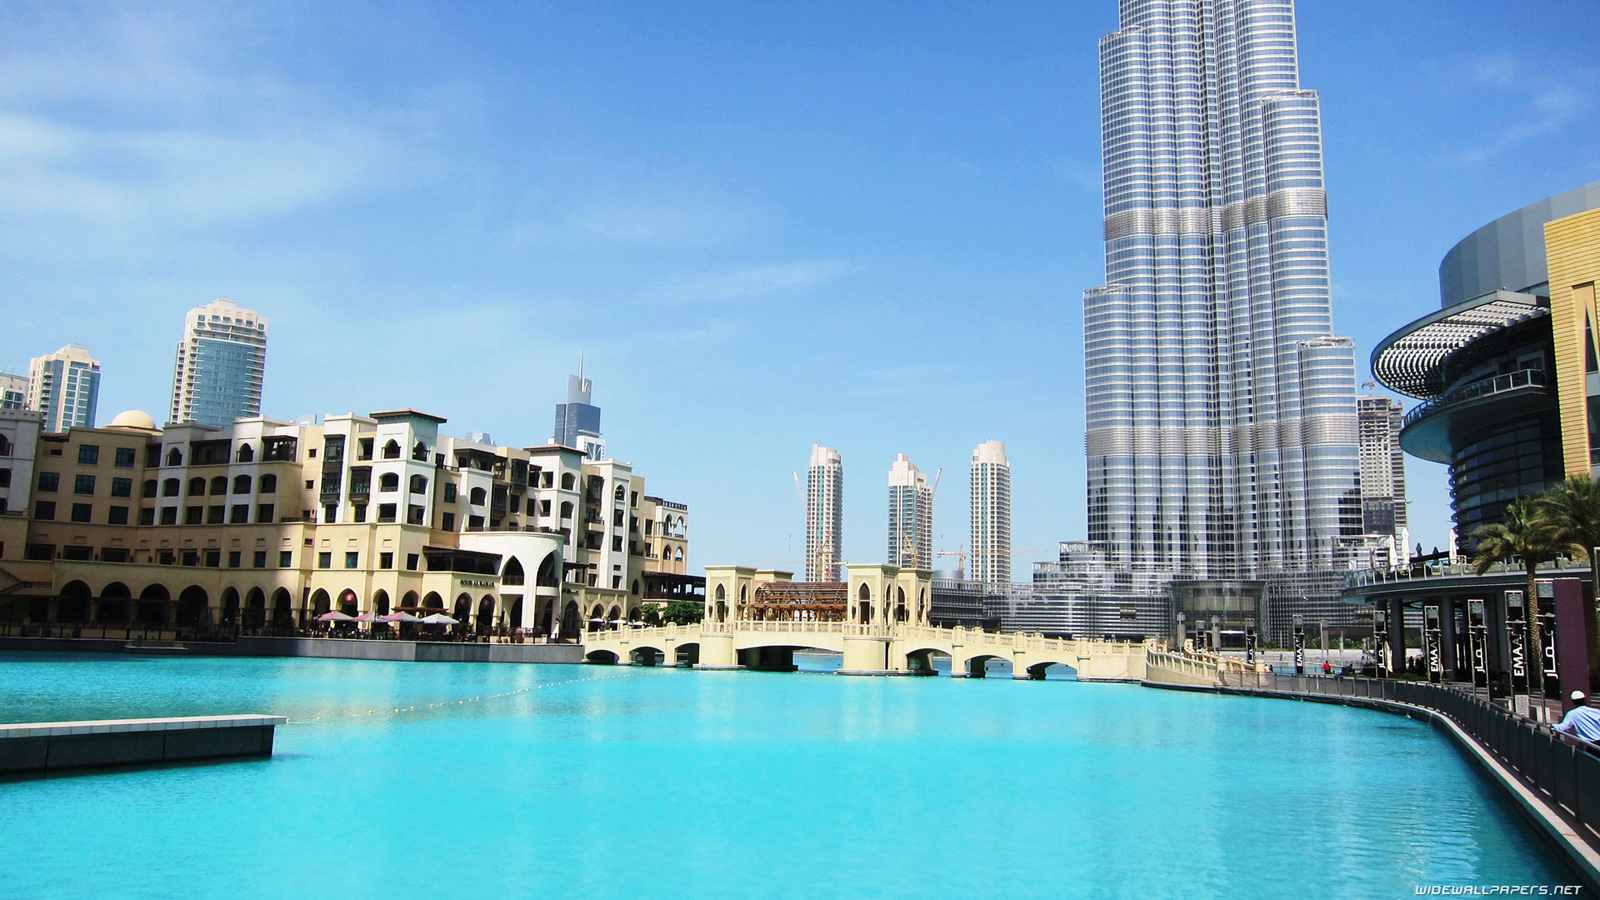 Burj Khalifa Dubai HD Wallpapers Pictures HD Wallapers for 1600x900